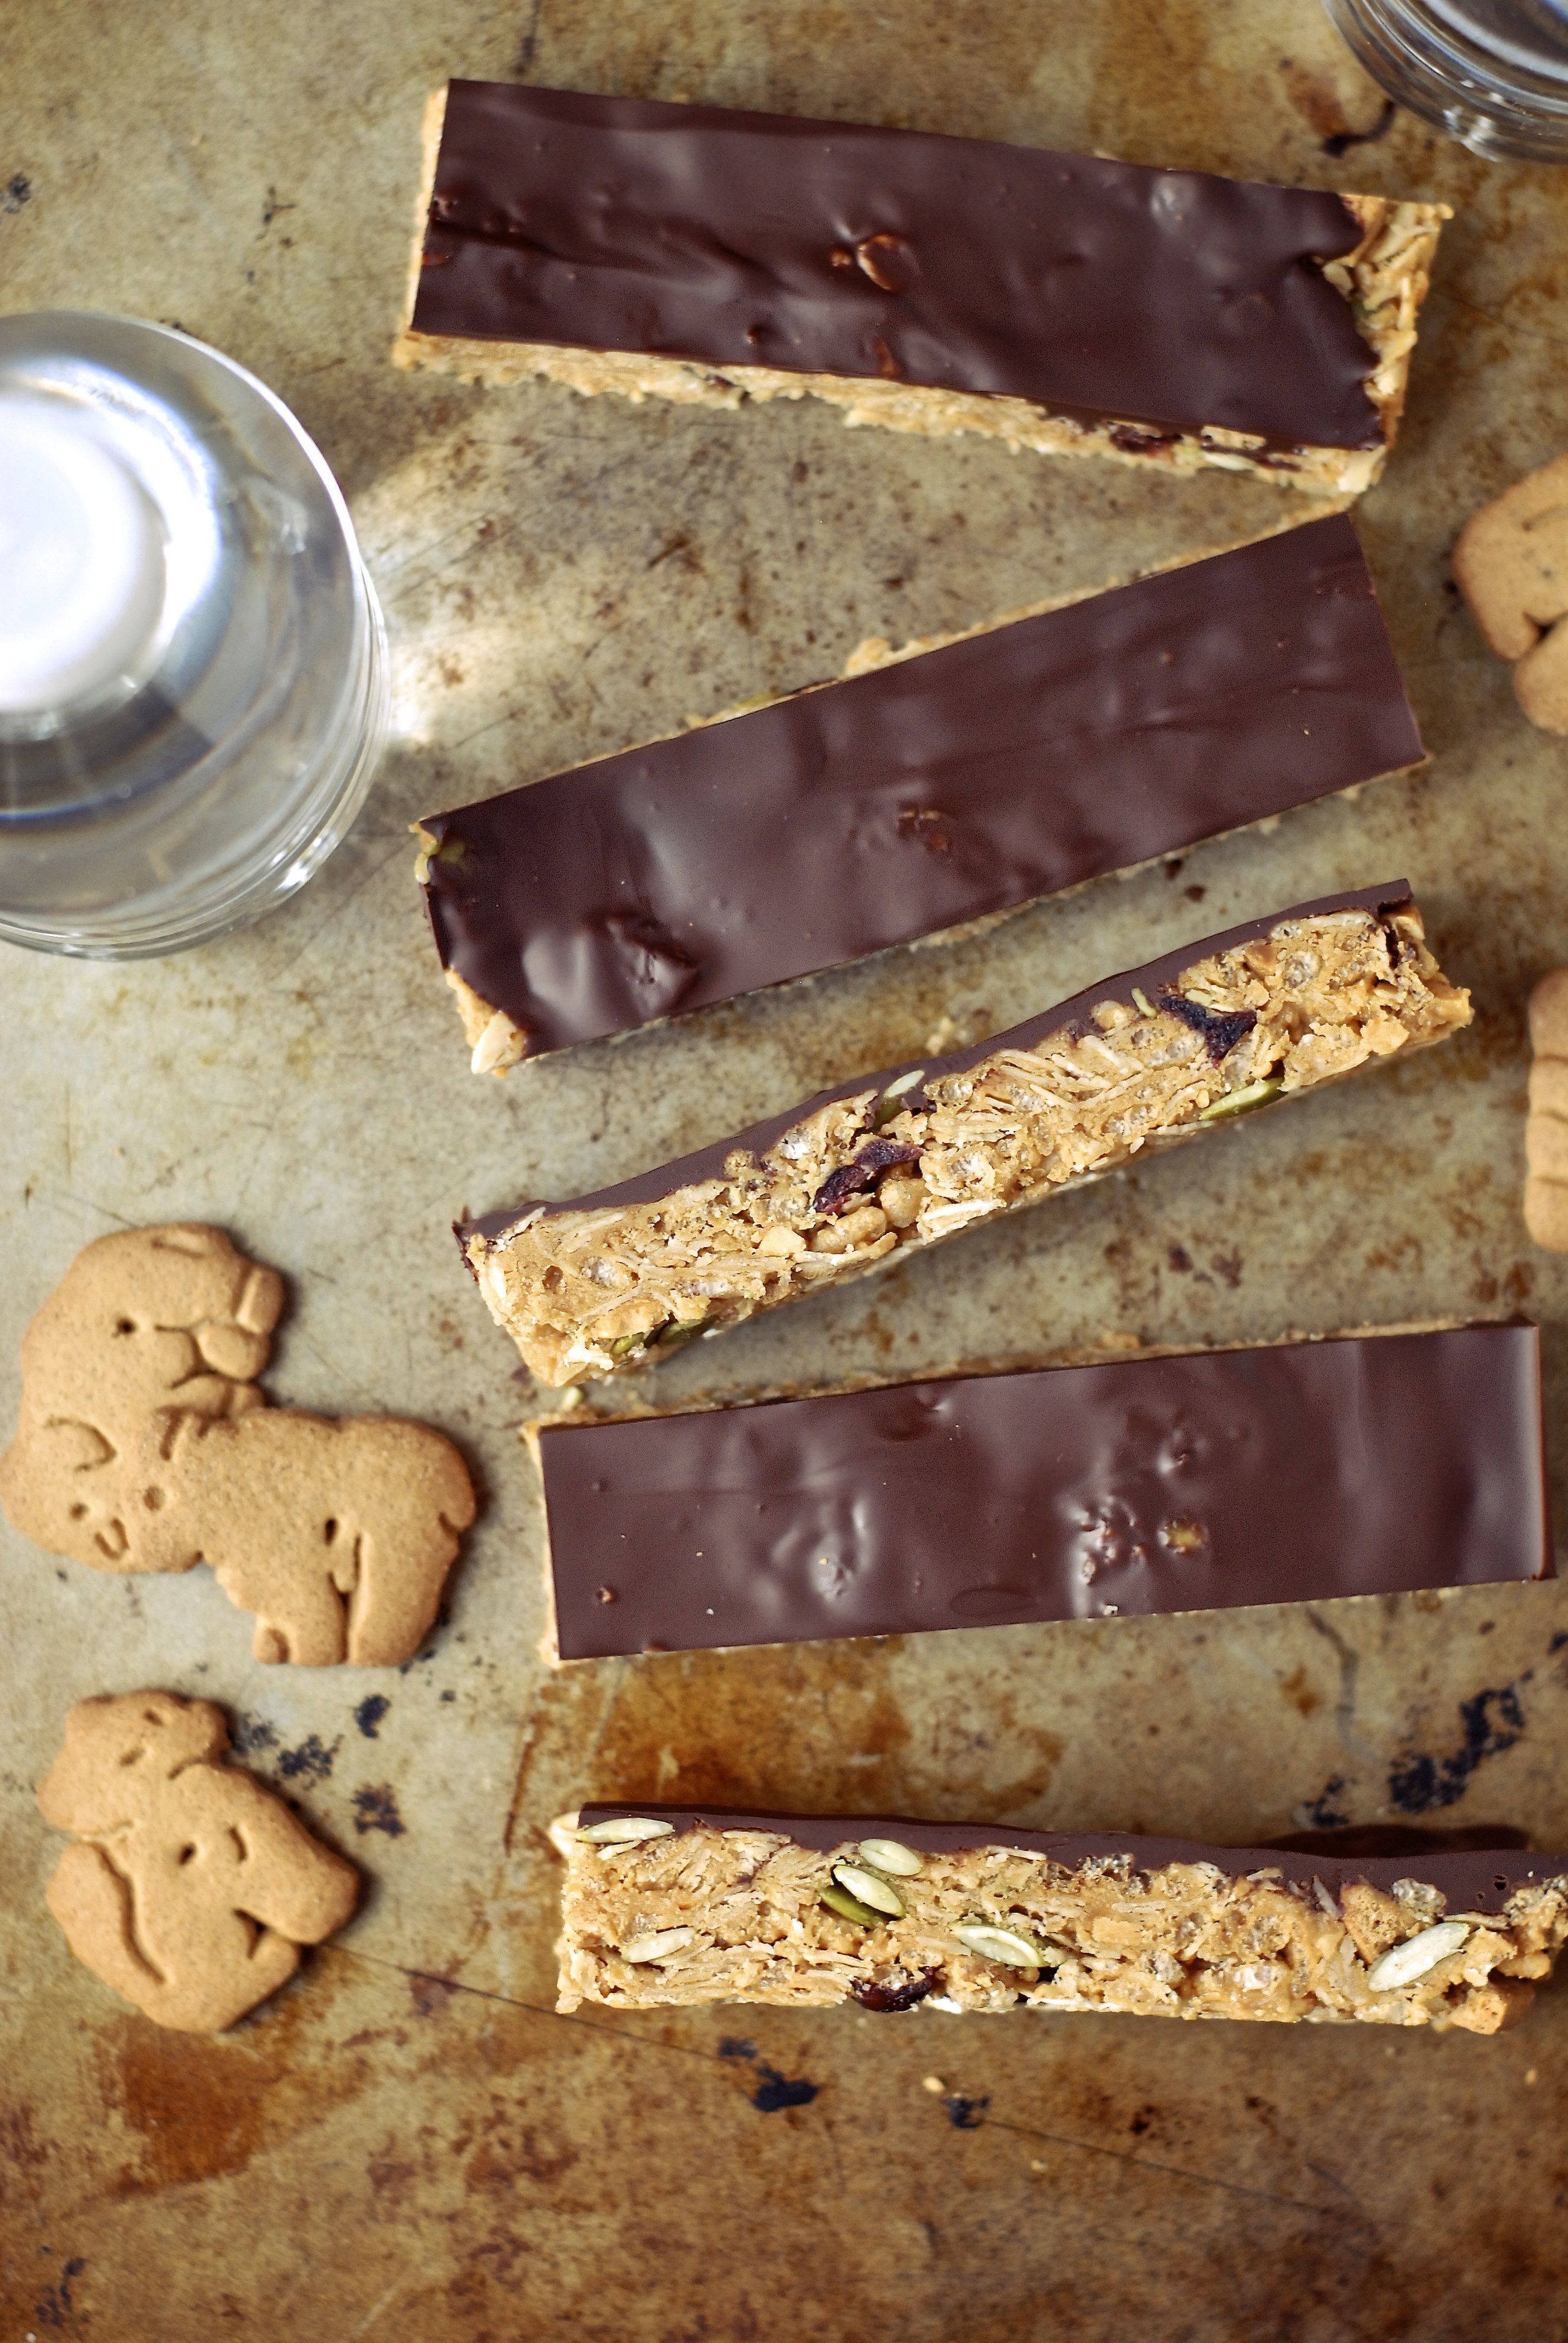 Chocolate Peanut Butter Graham Crunch Snack Bars